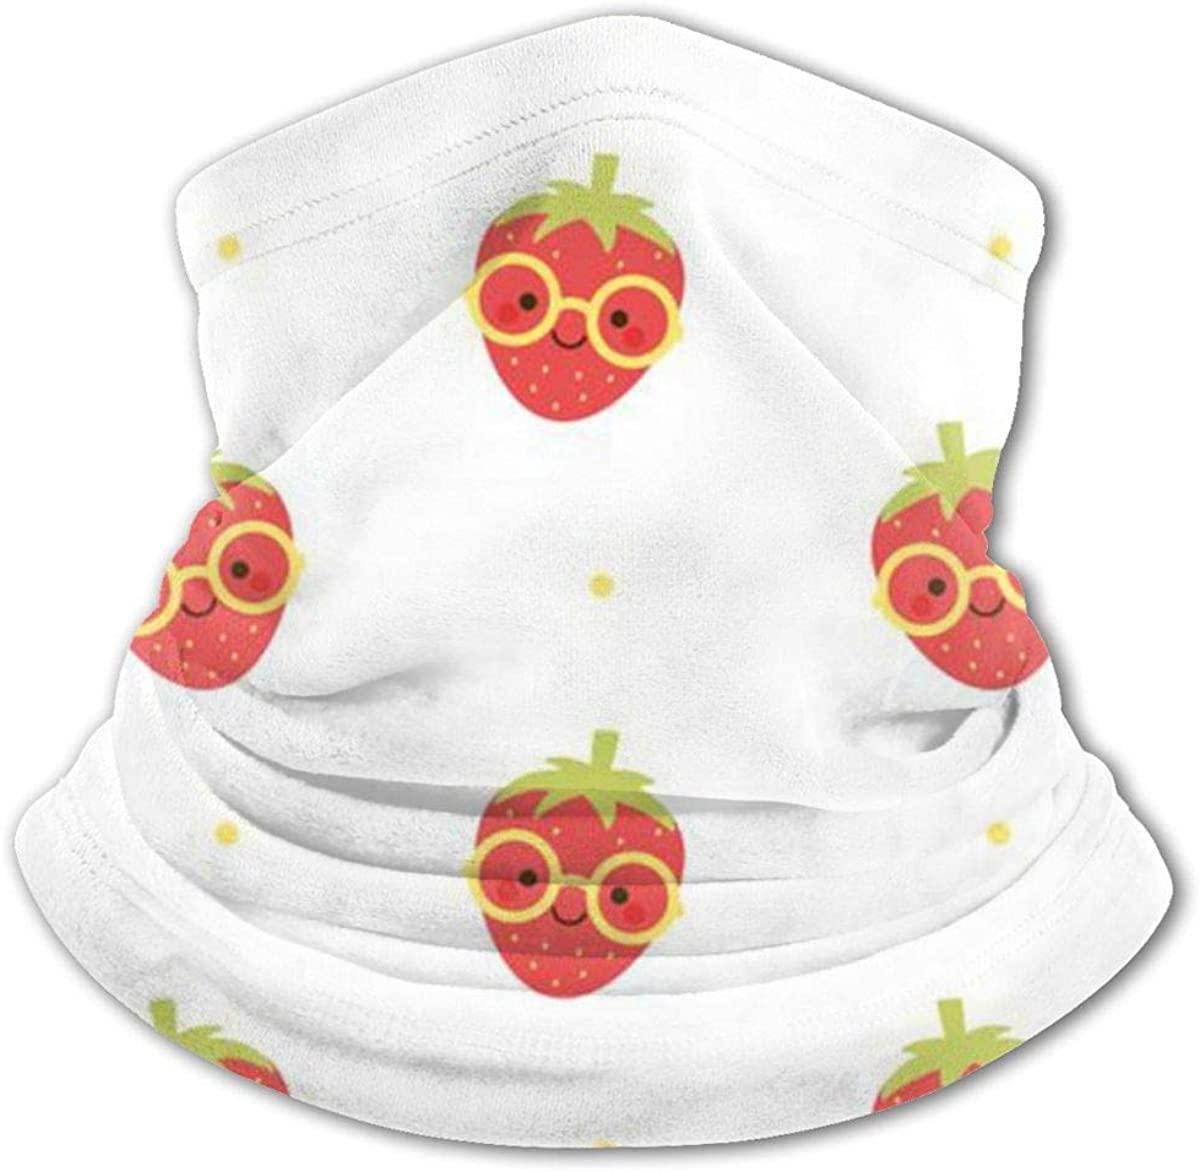 Strawberry Wear Sunglasses Headwear For Girls And Boys, Head Wrap, Neck Gaiter, Headband, Tenn Fishing Mask, Magic Scarf, Tube Mask, Face Bandana Mask For Camping Running Cycling